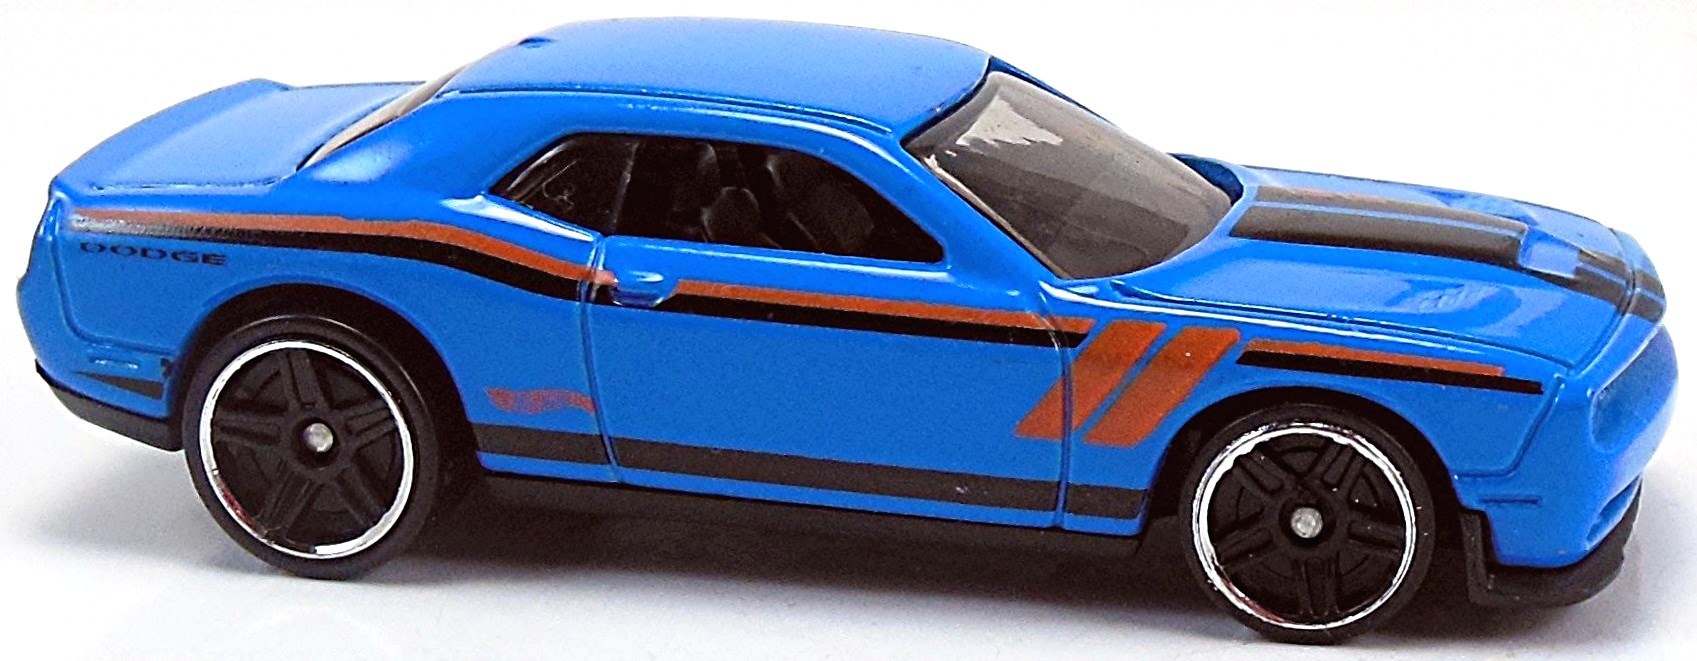 15 Dodge Challenger SRT - 73mm - 2015 | Hot Wheels Newsletter